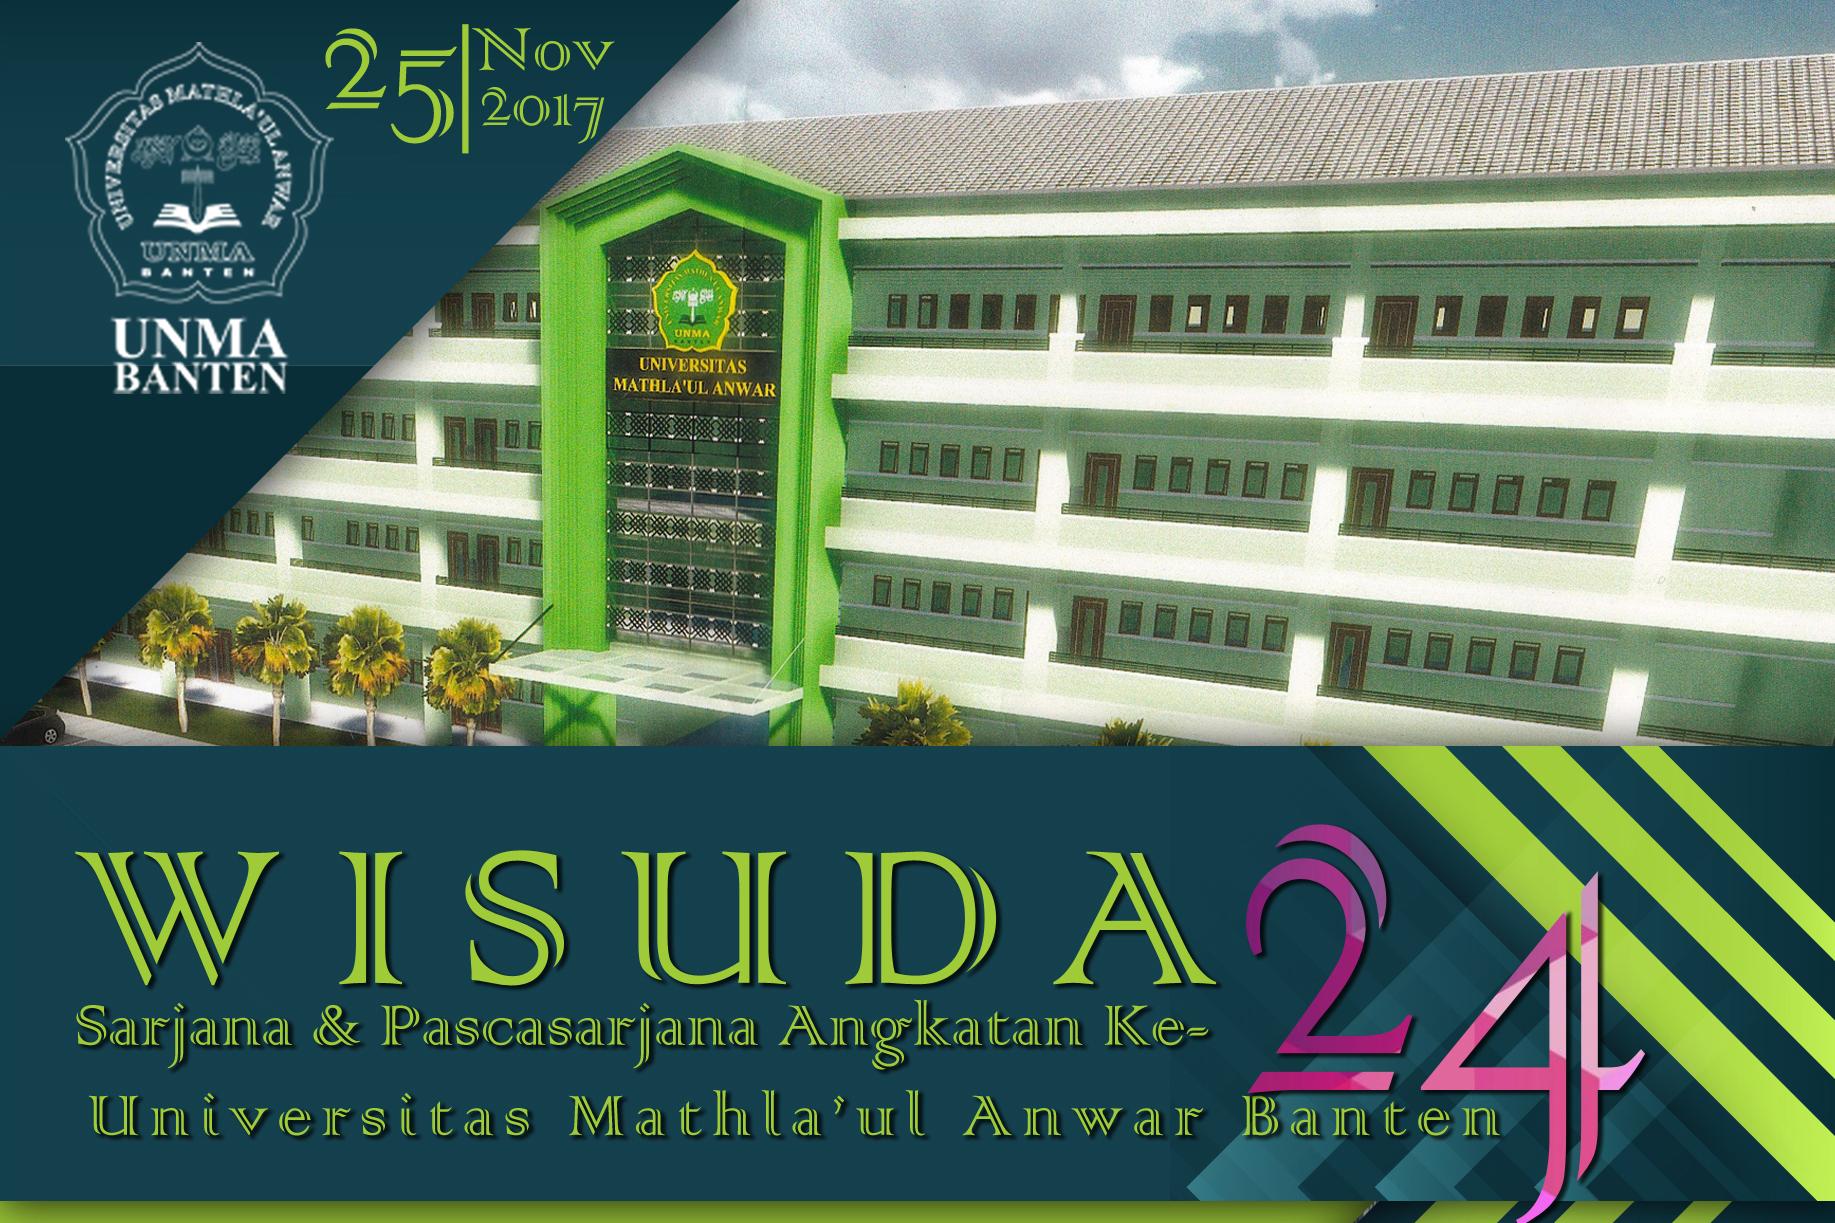 Wisuda ke-24 UNMA Banten Luluskan 529 Sarjana